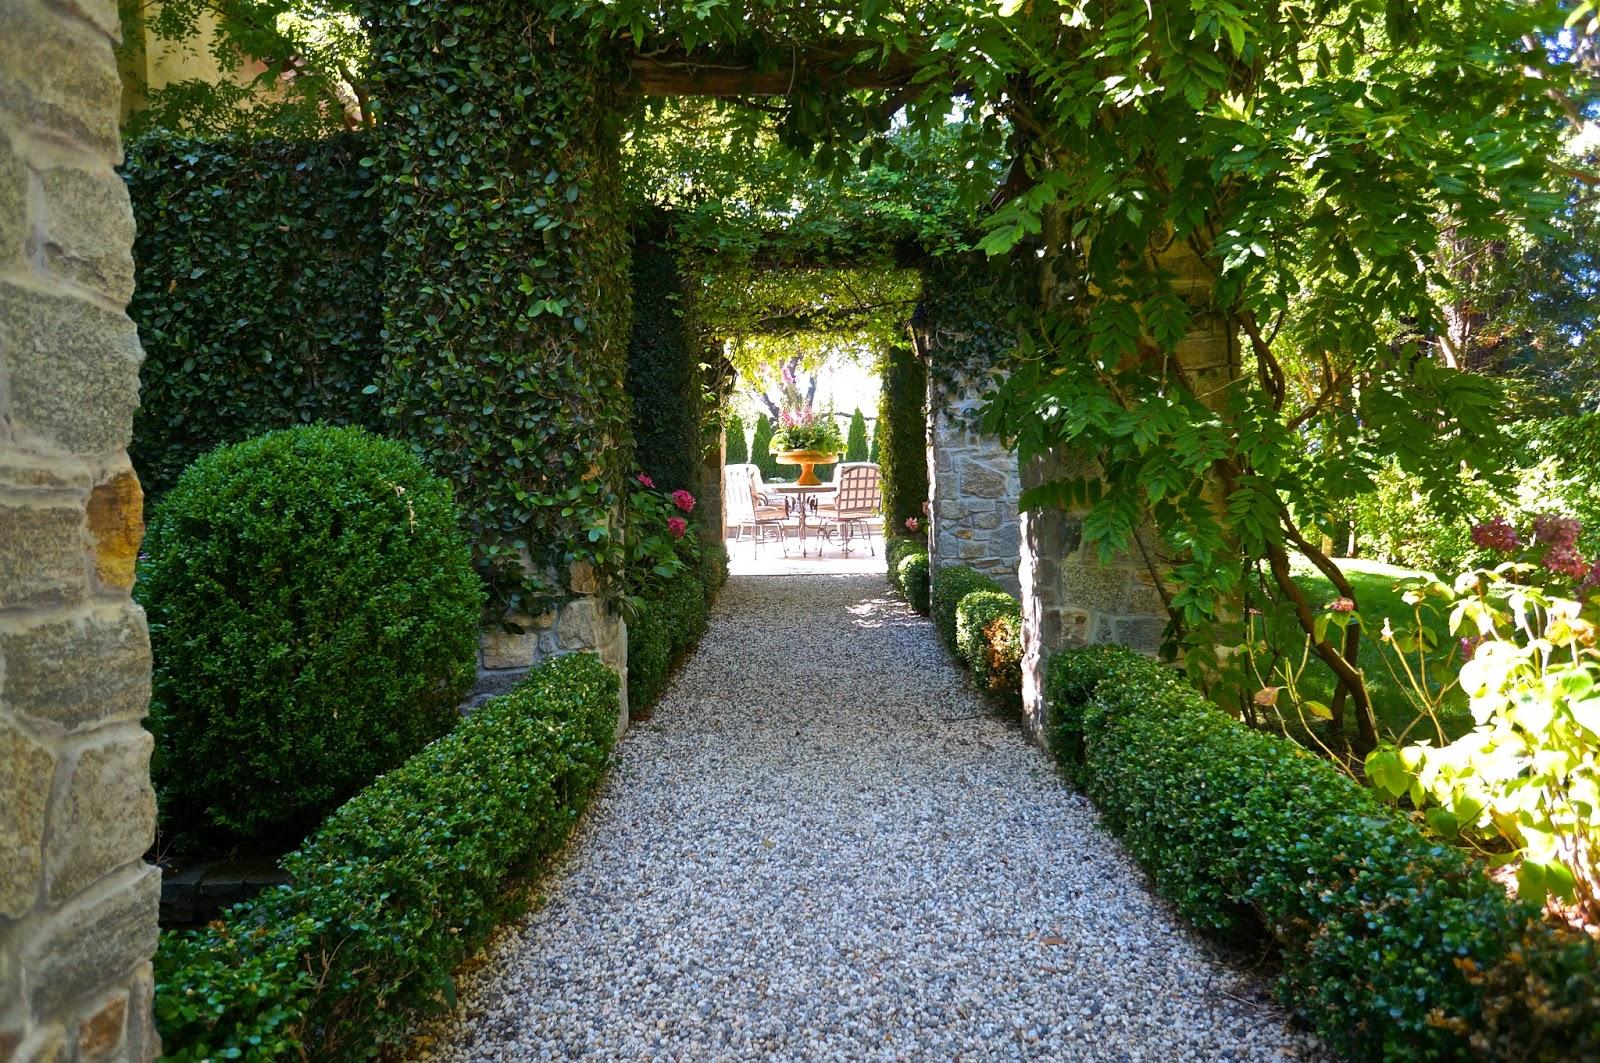 Vignette Design A Romantic Garden In All Its Glory